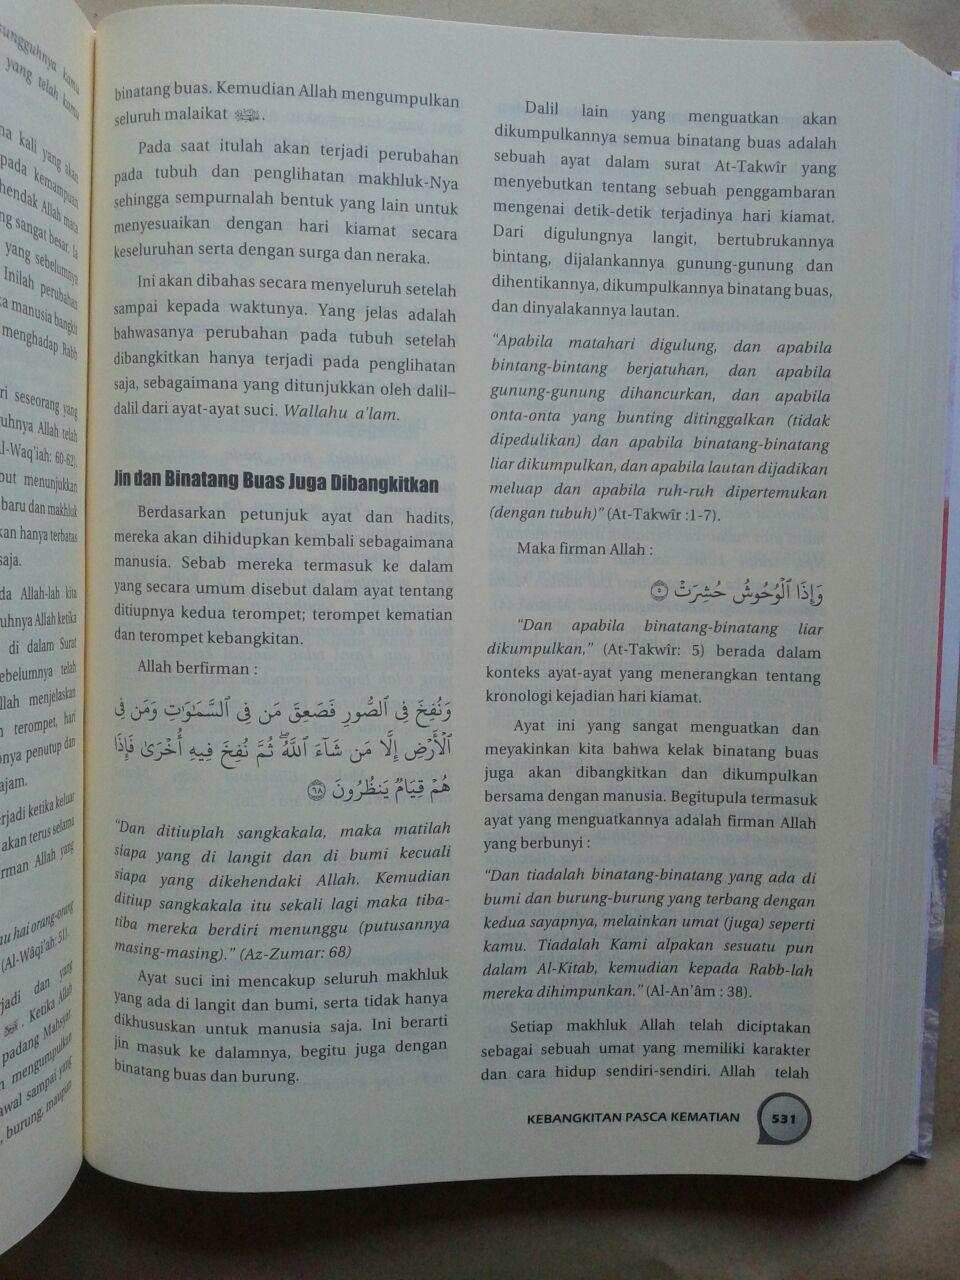 Buku Ensiklopedi Akhir Zaman 199.000 20% 159.200 Ummul Qura isi